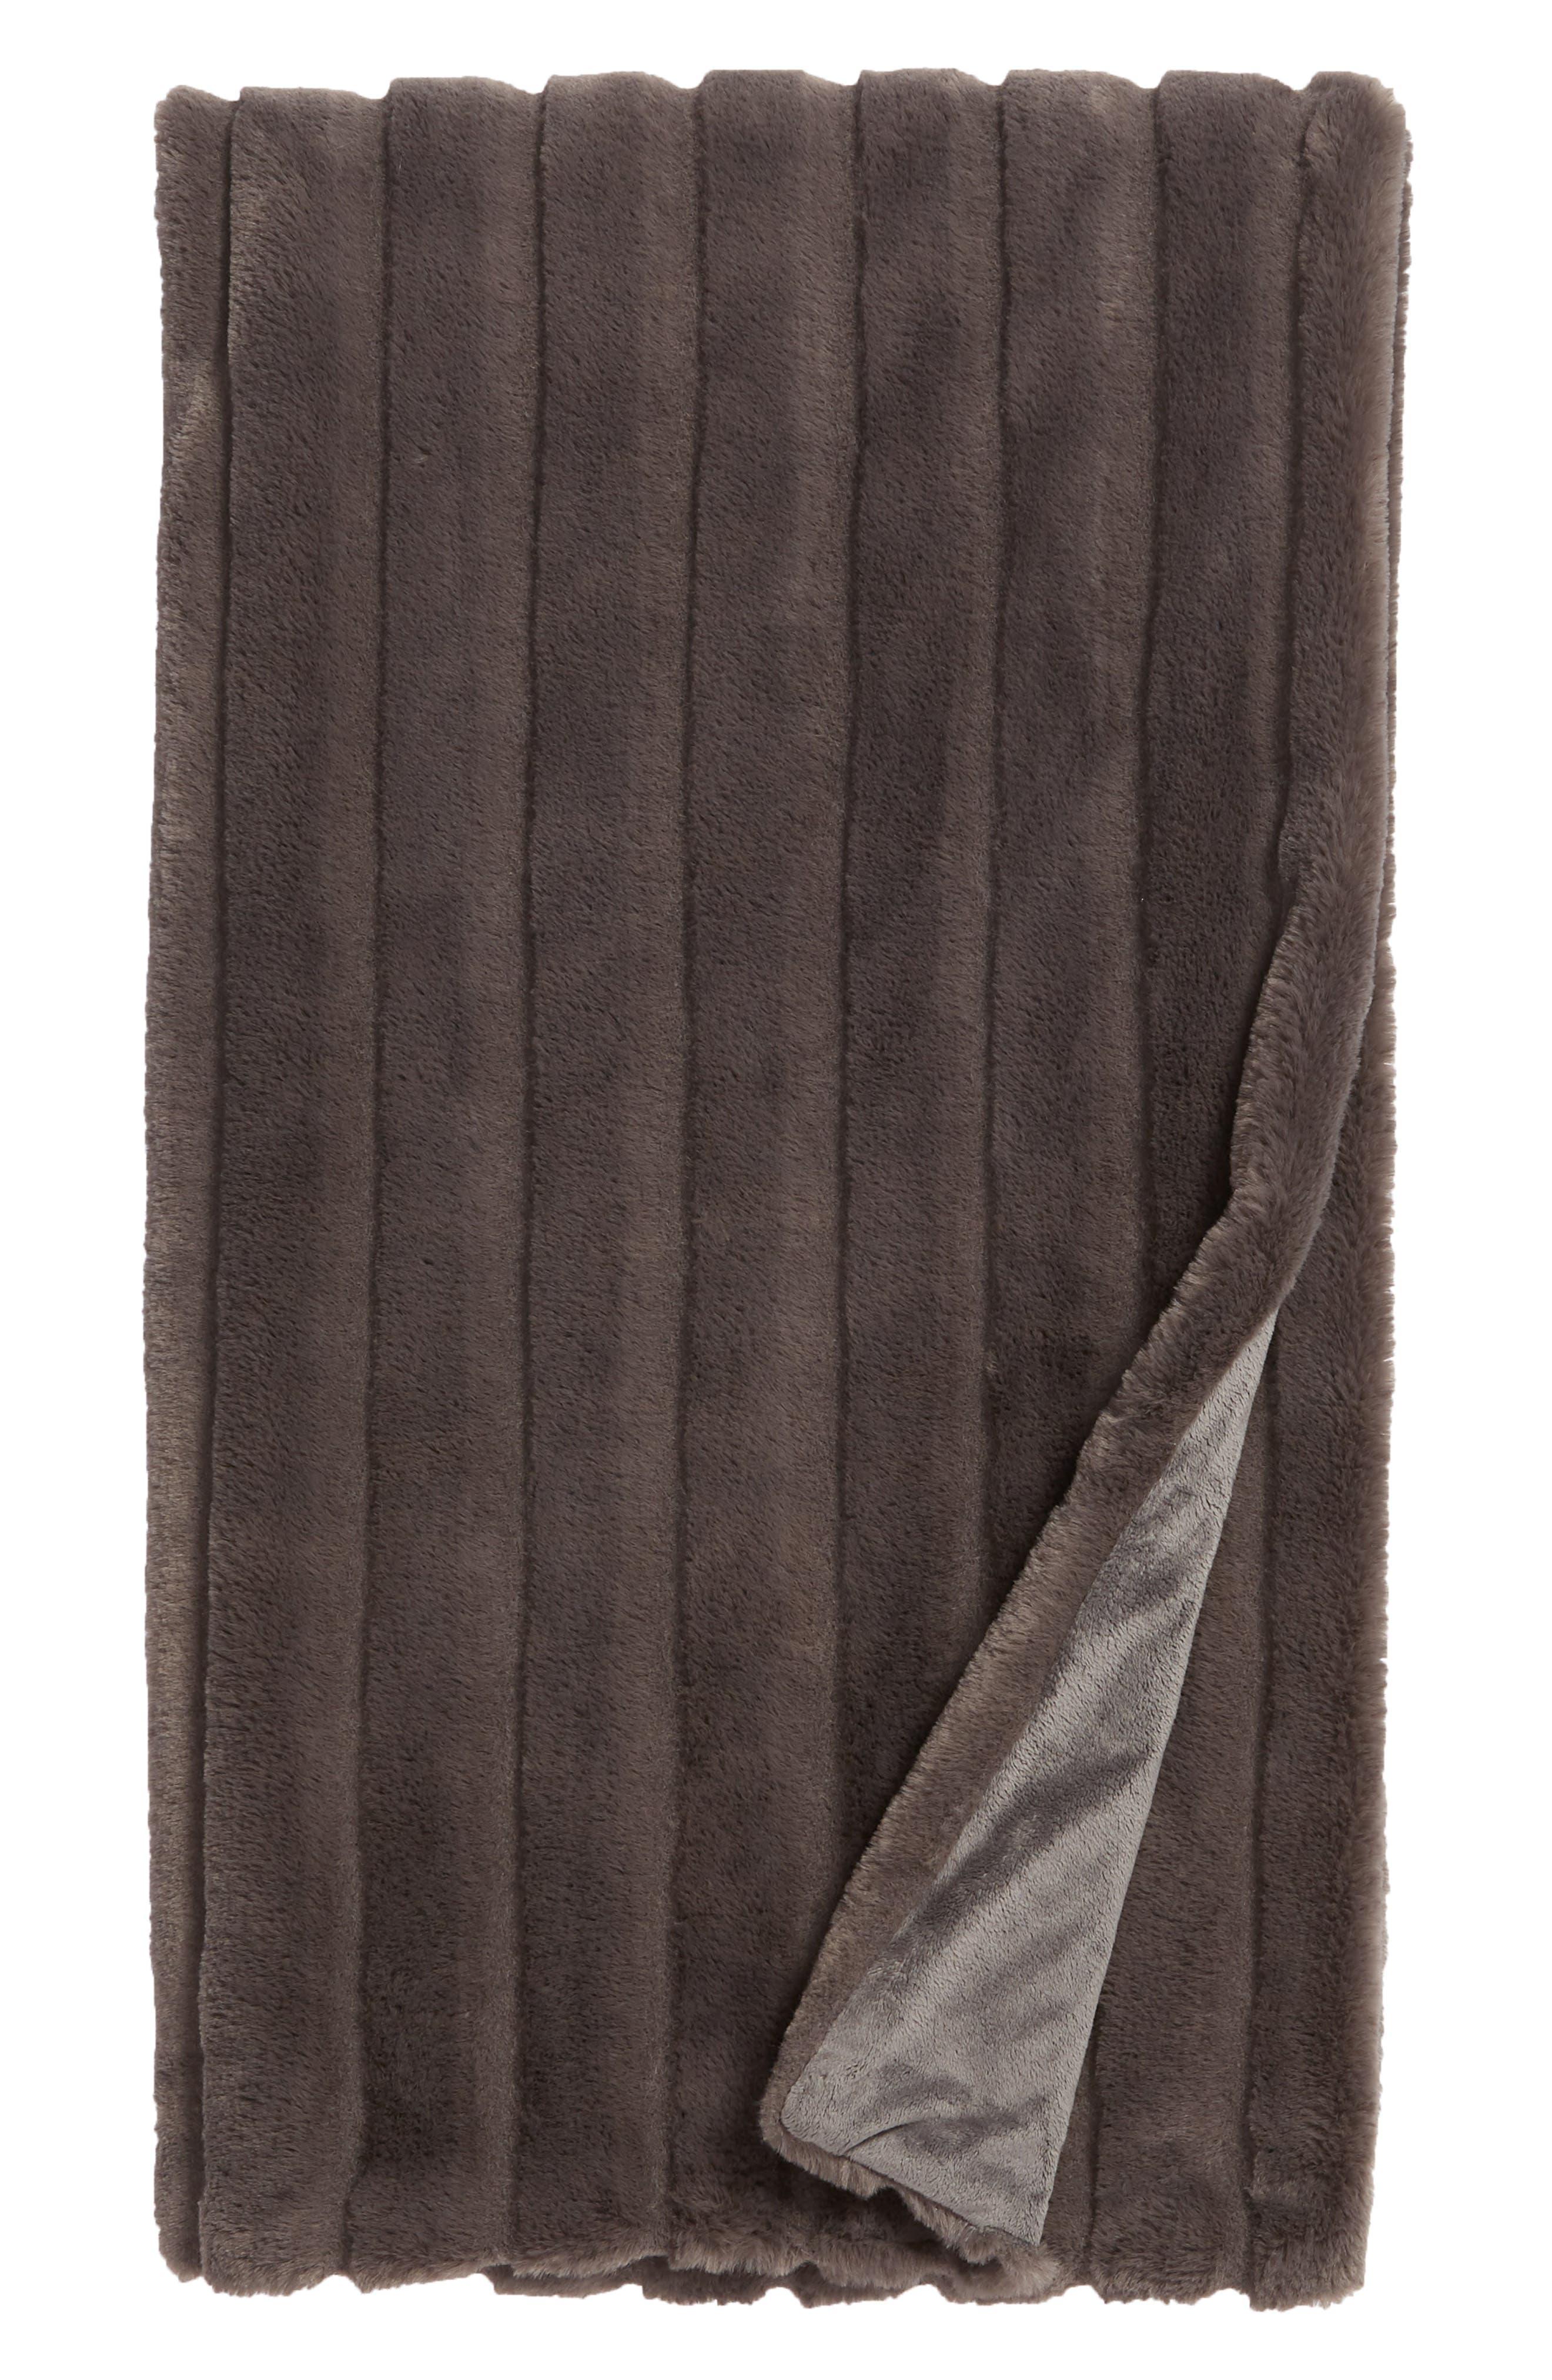 Sheared Stripe Faux Fur Throw,                             Main thumbnail 1, color,                             GREY MAGNET